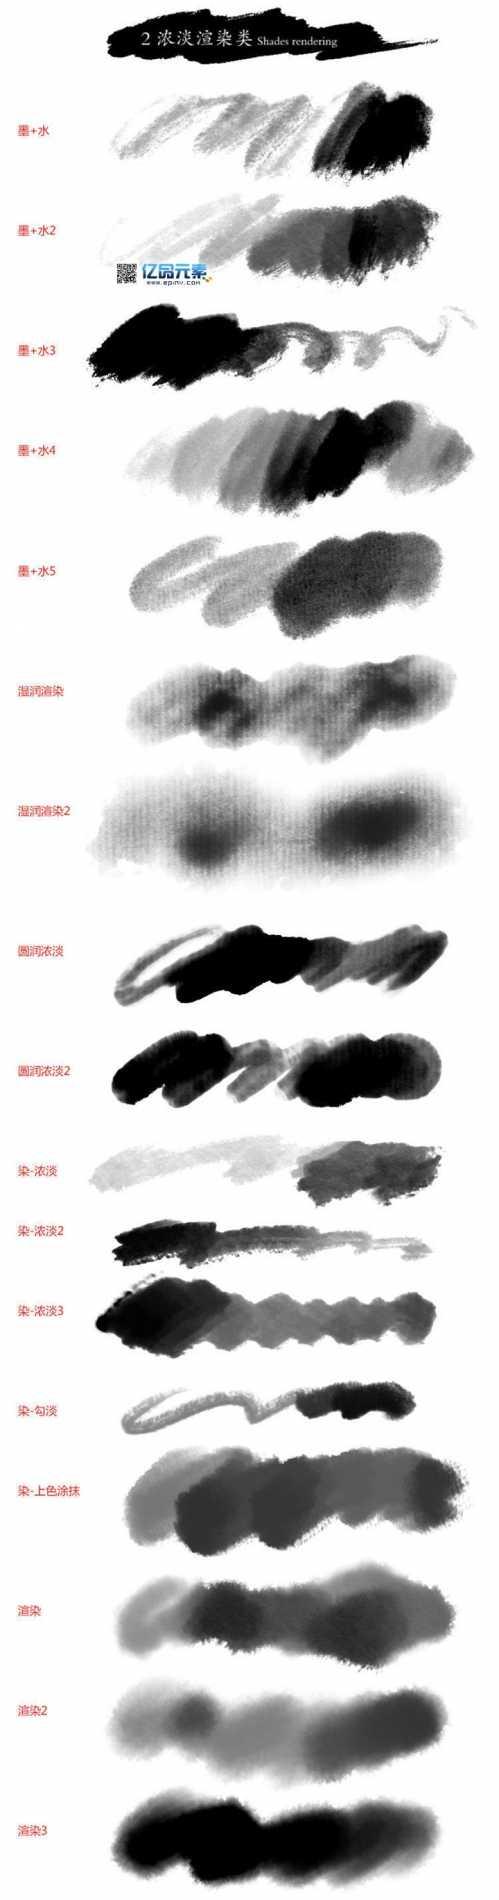 PS灵华水墨画笔6.0+4.0免费版- 画水墨画